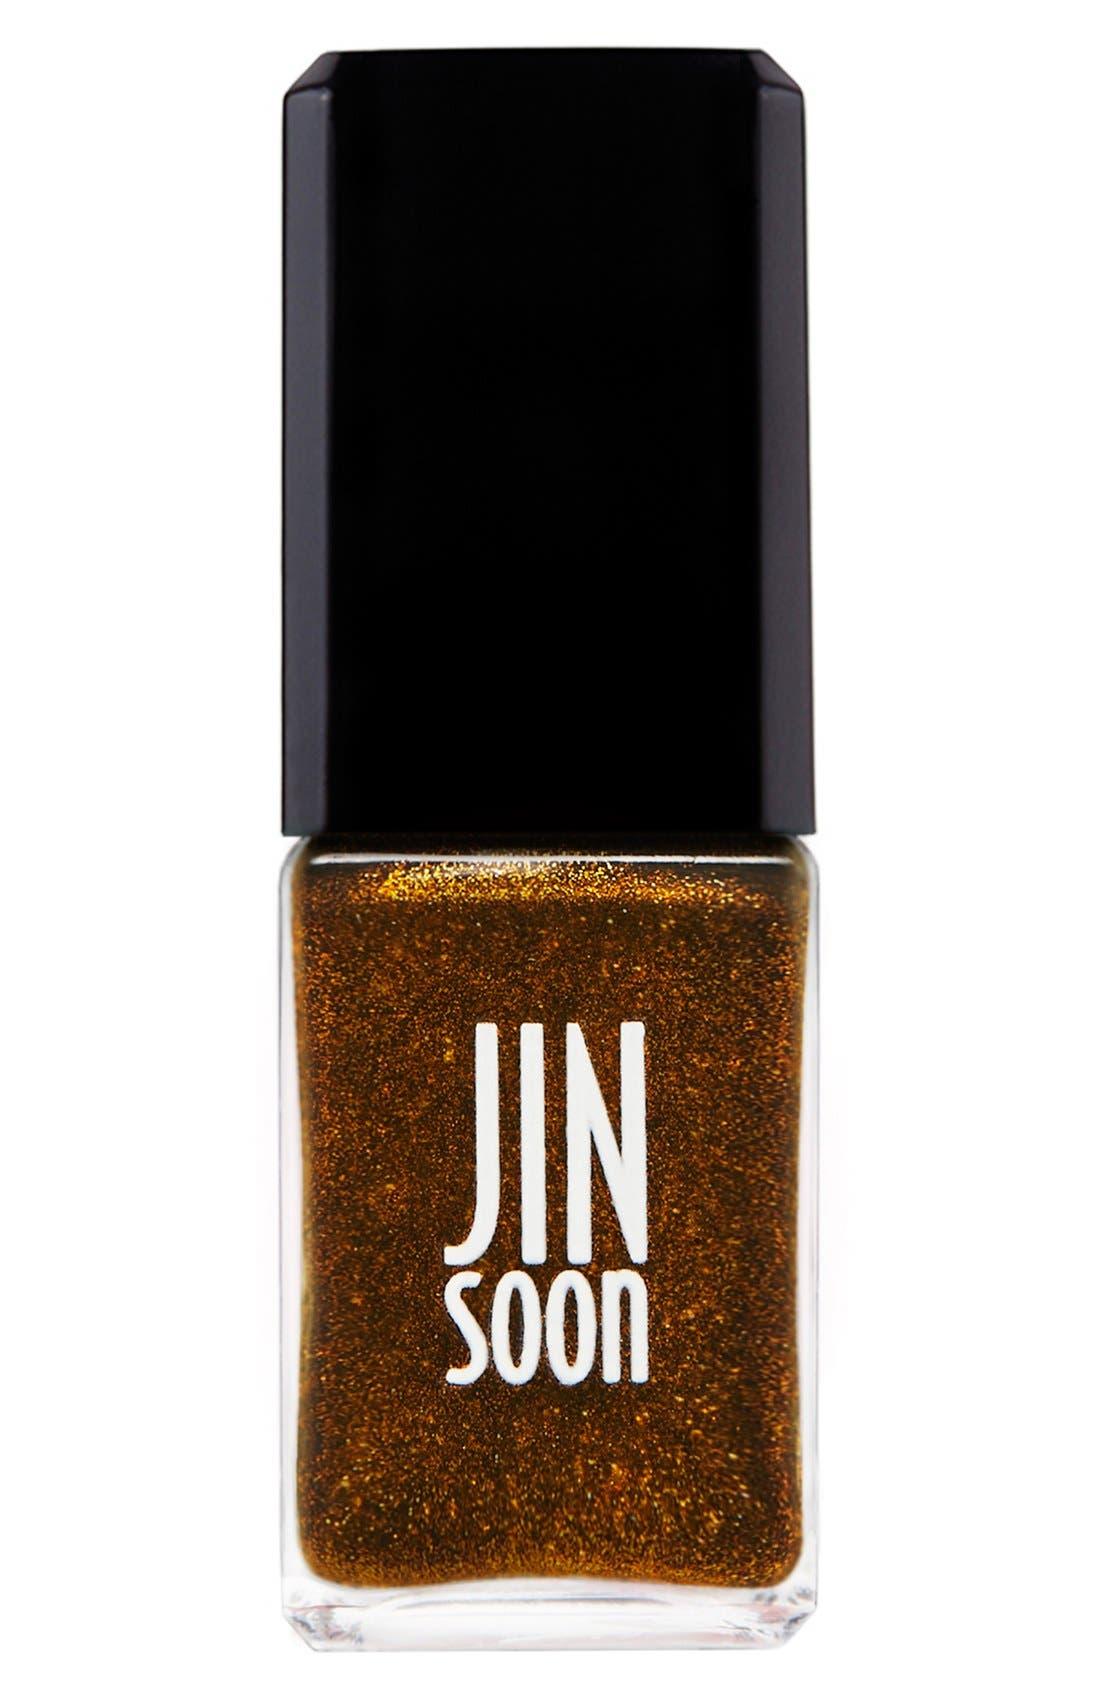 JINsoon 'Verismo' Nail Lacquer